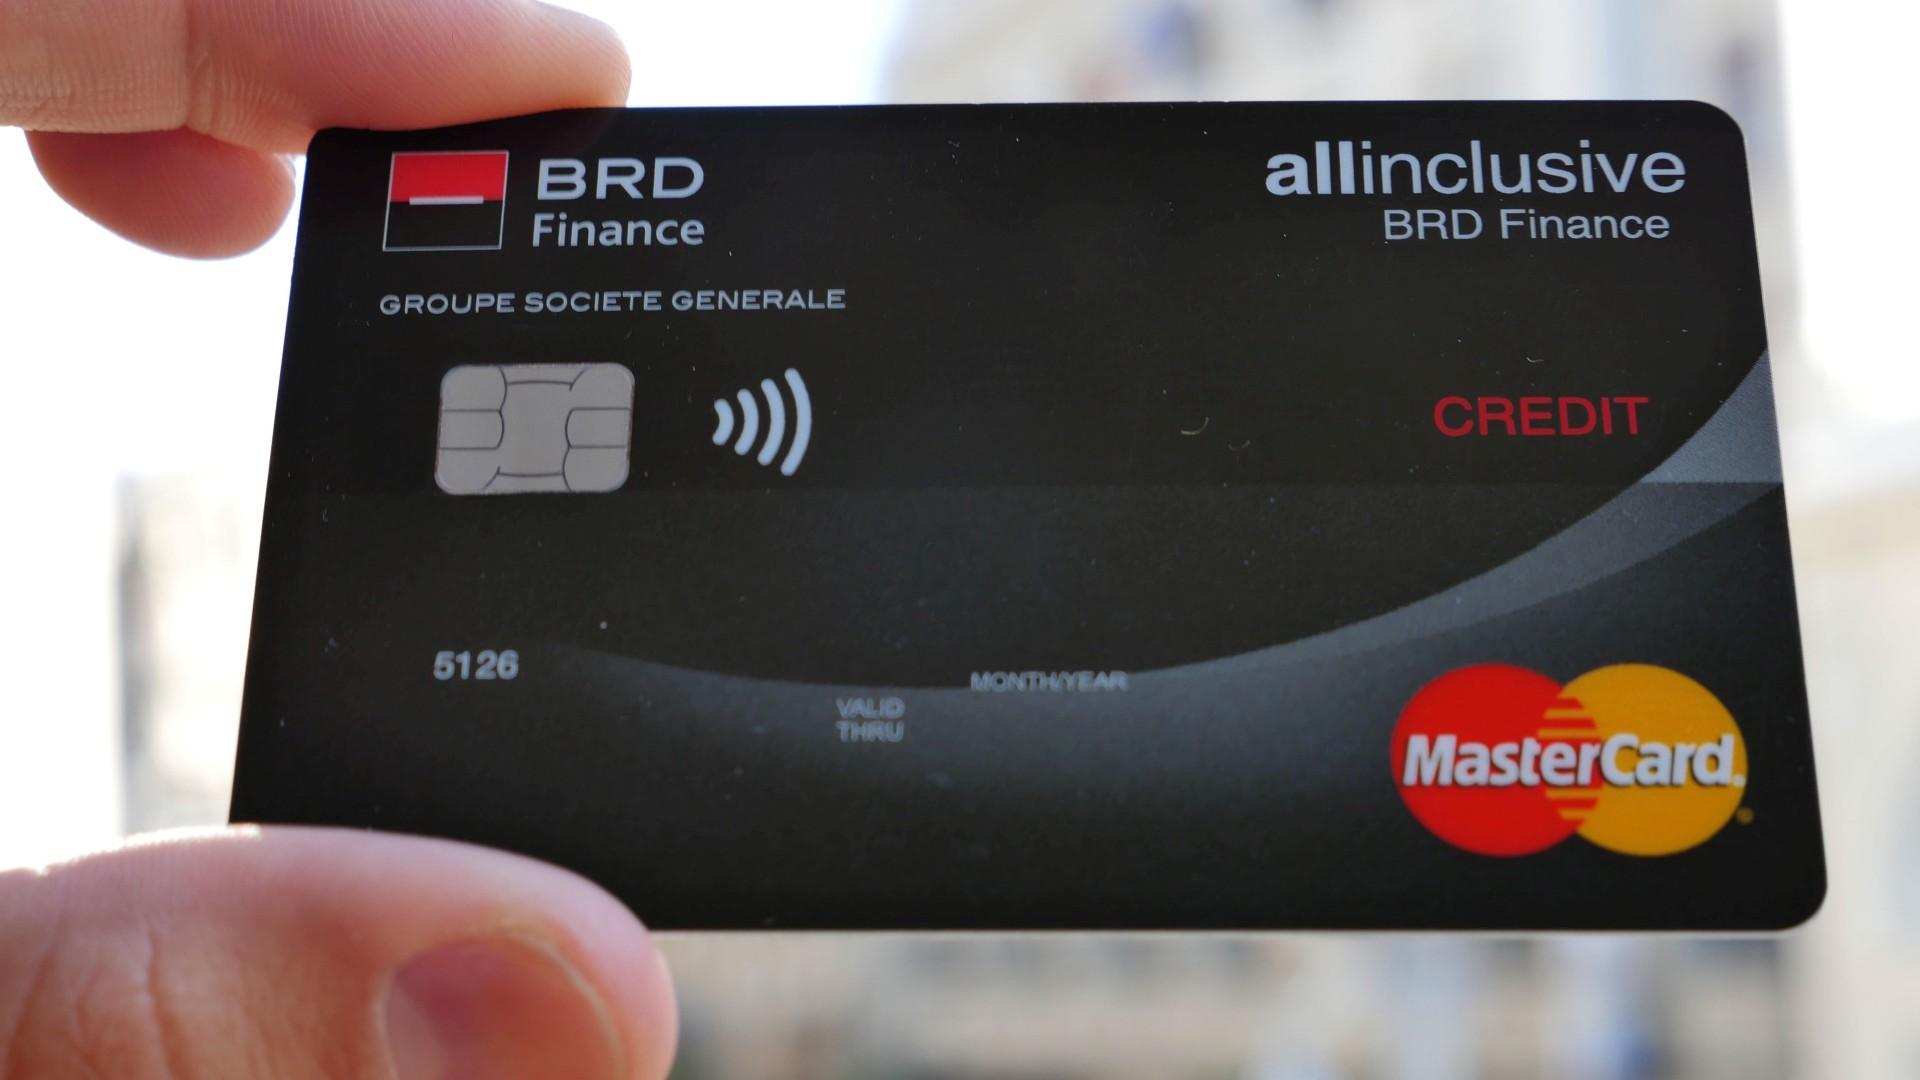 brd_finance_allinclusive